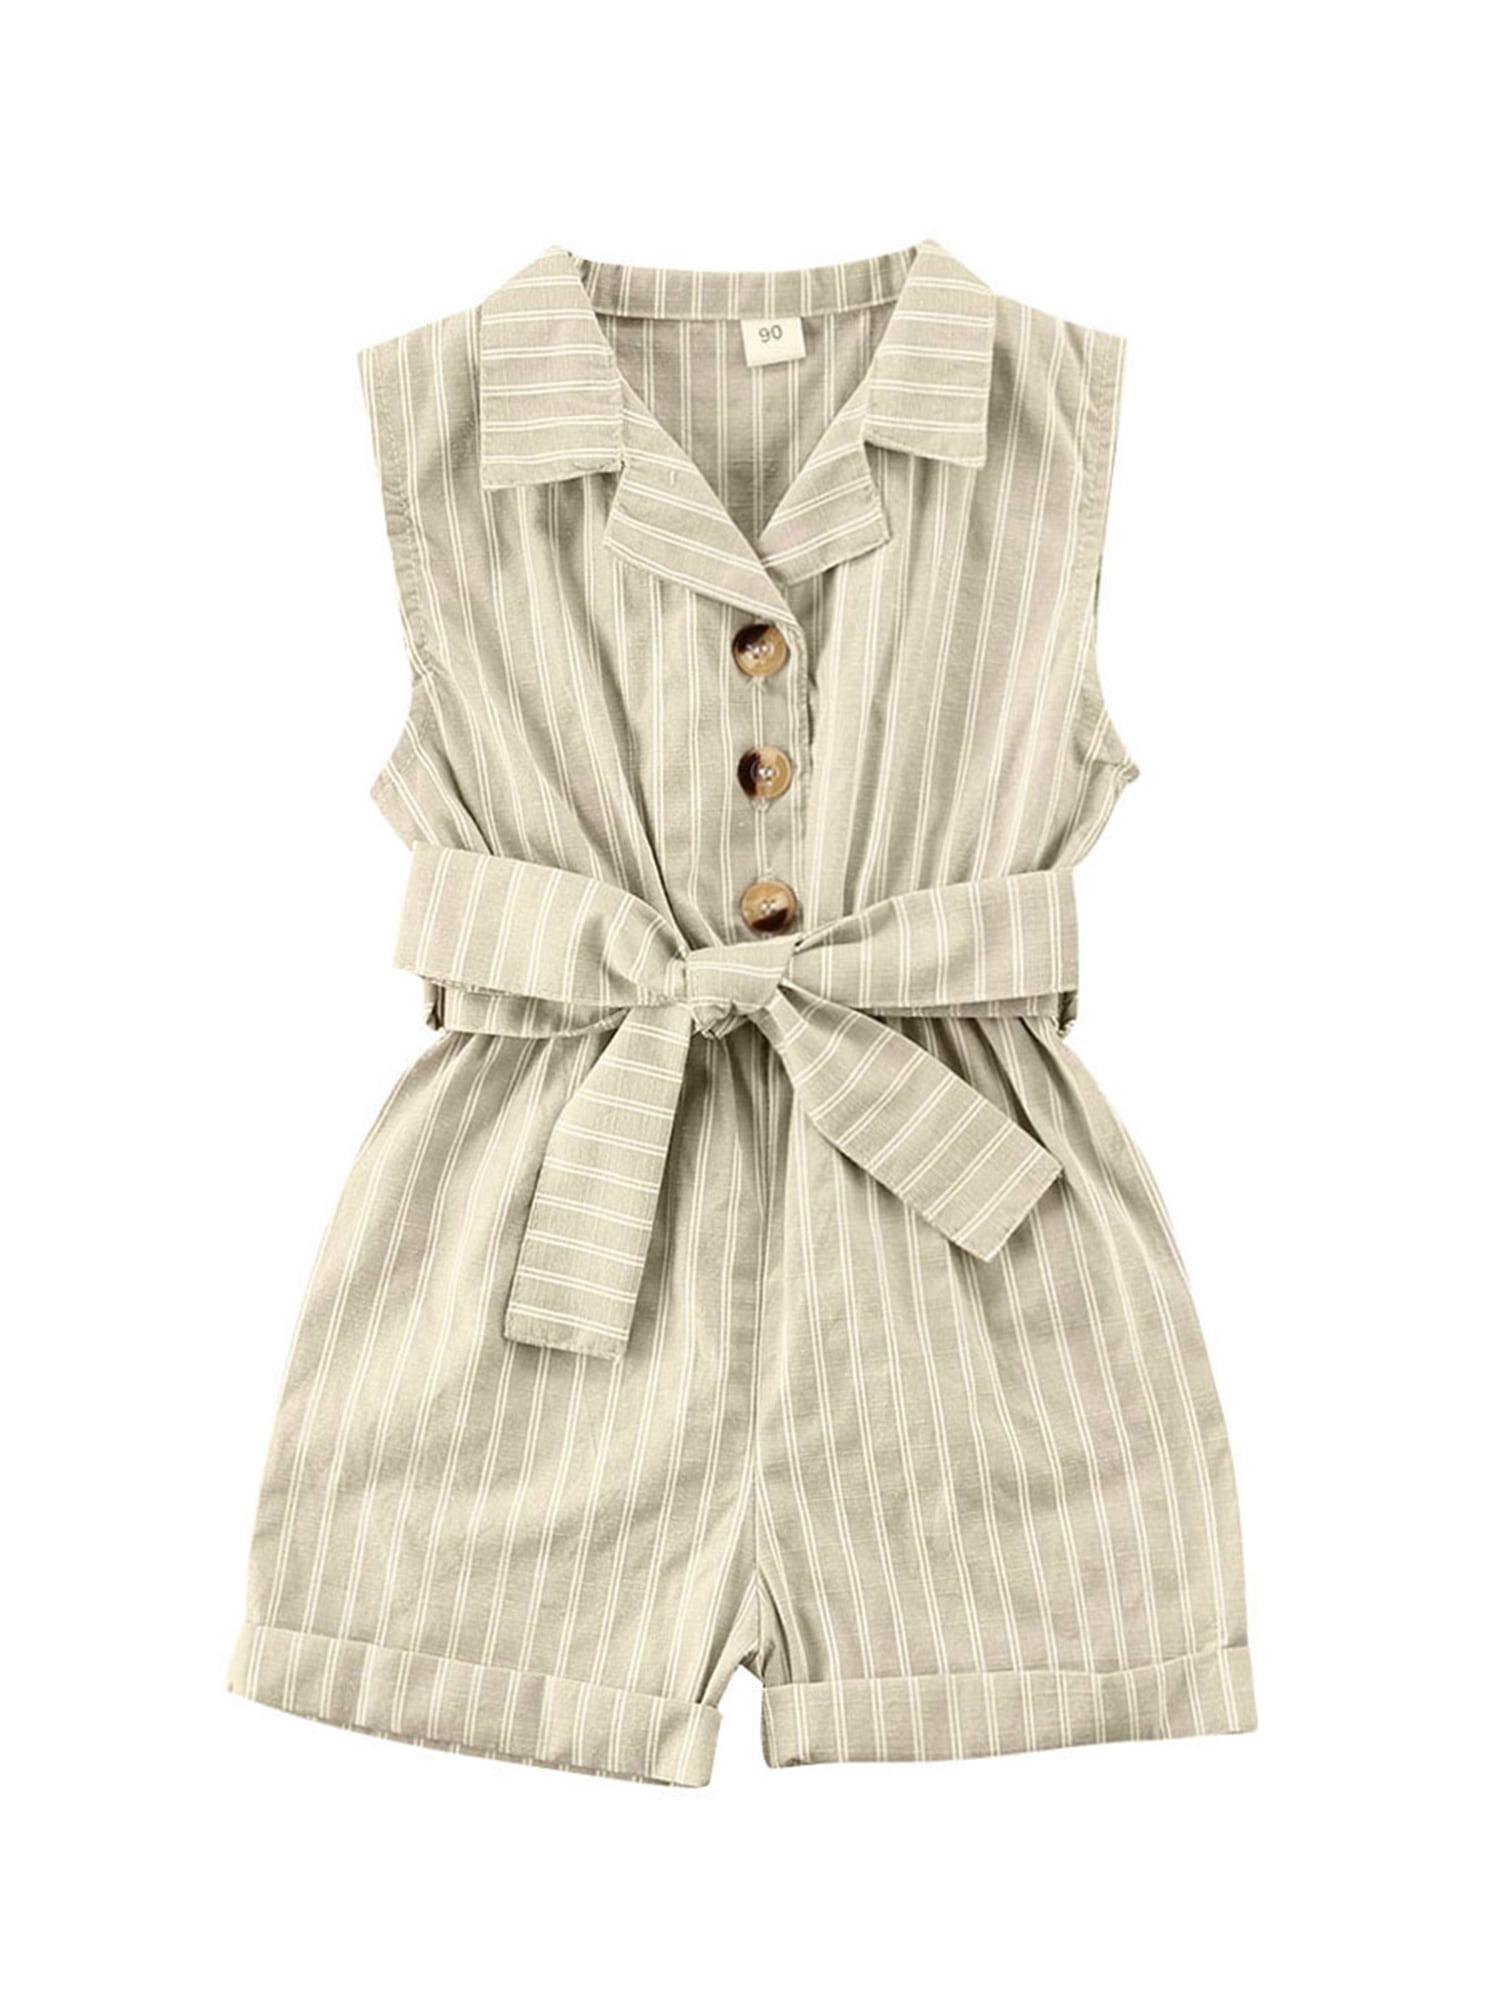 Girls Rompers Overalls Striped Playsuit Sleeveless Turn Down Button  Jumpsuits - Walmart.com - Walmart.com